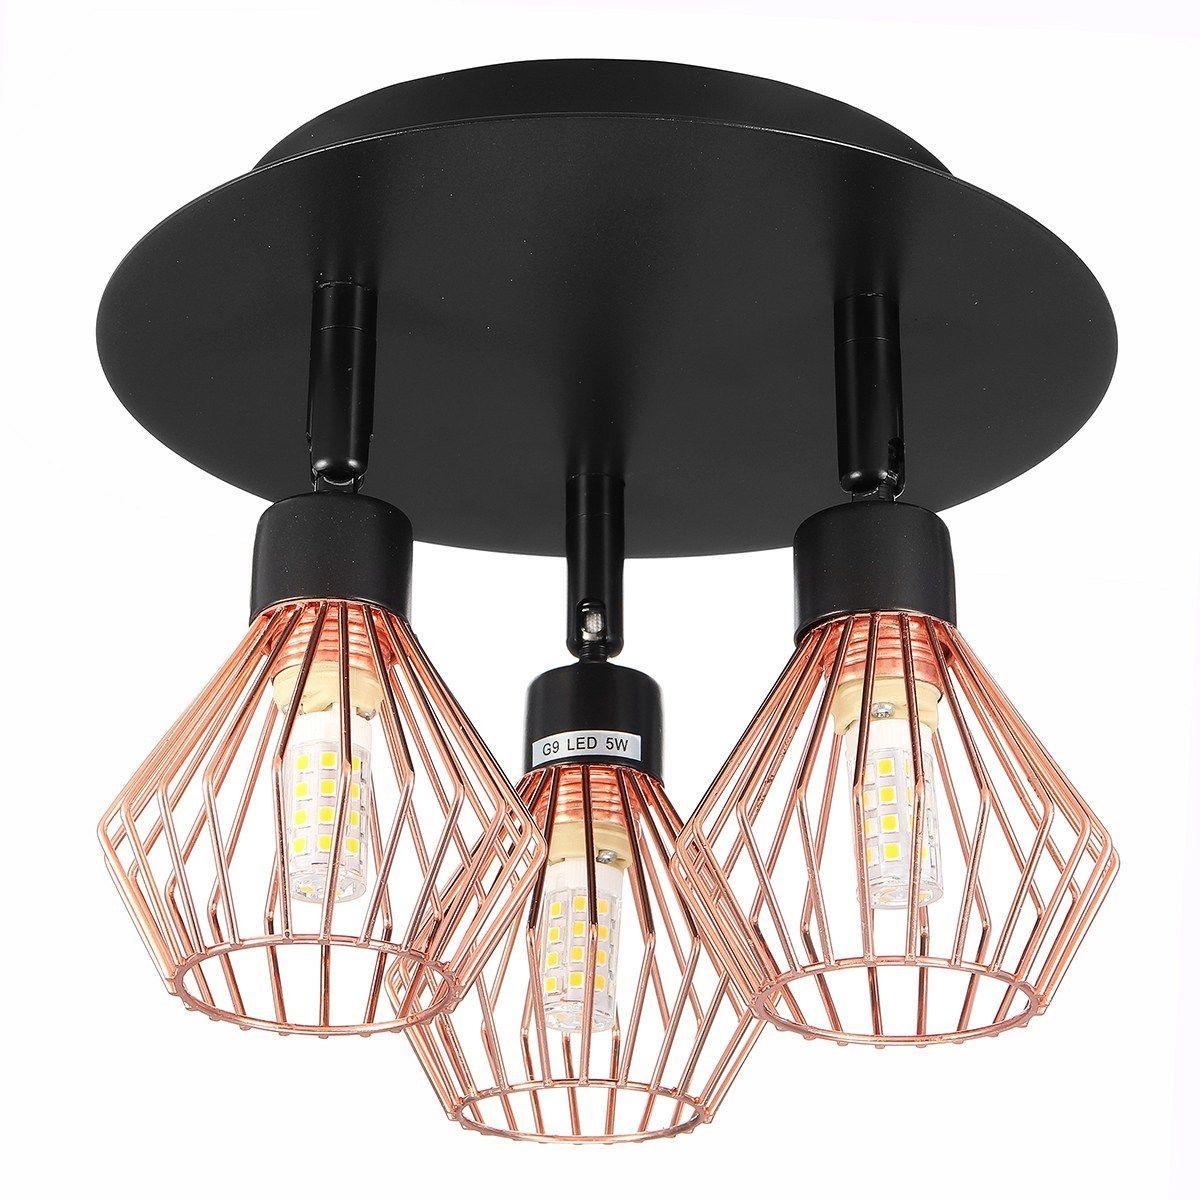 3 Way Ceiling Light Modern G9 Copper Cage Industrial Pendant Lamp Shade Spotlight Home Decorations In 2020 Ceiling Lights Pendant Lamp Shade Modern Ceiling Light